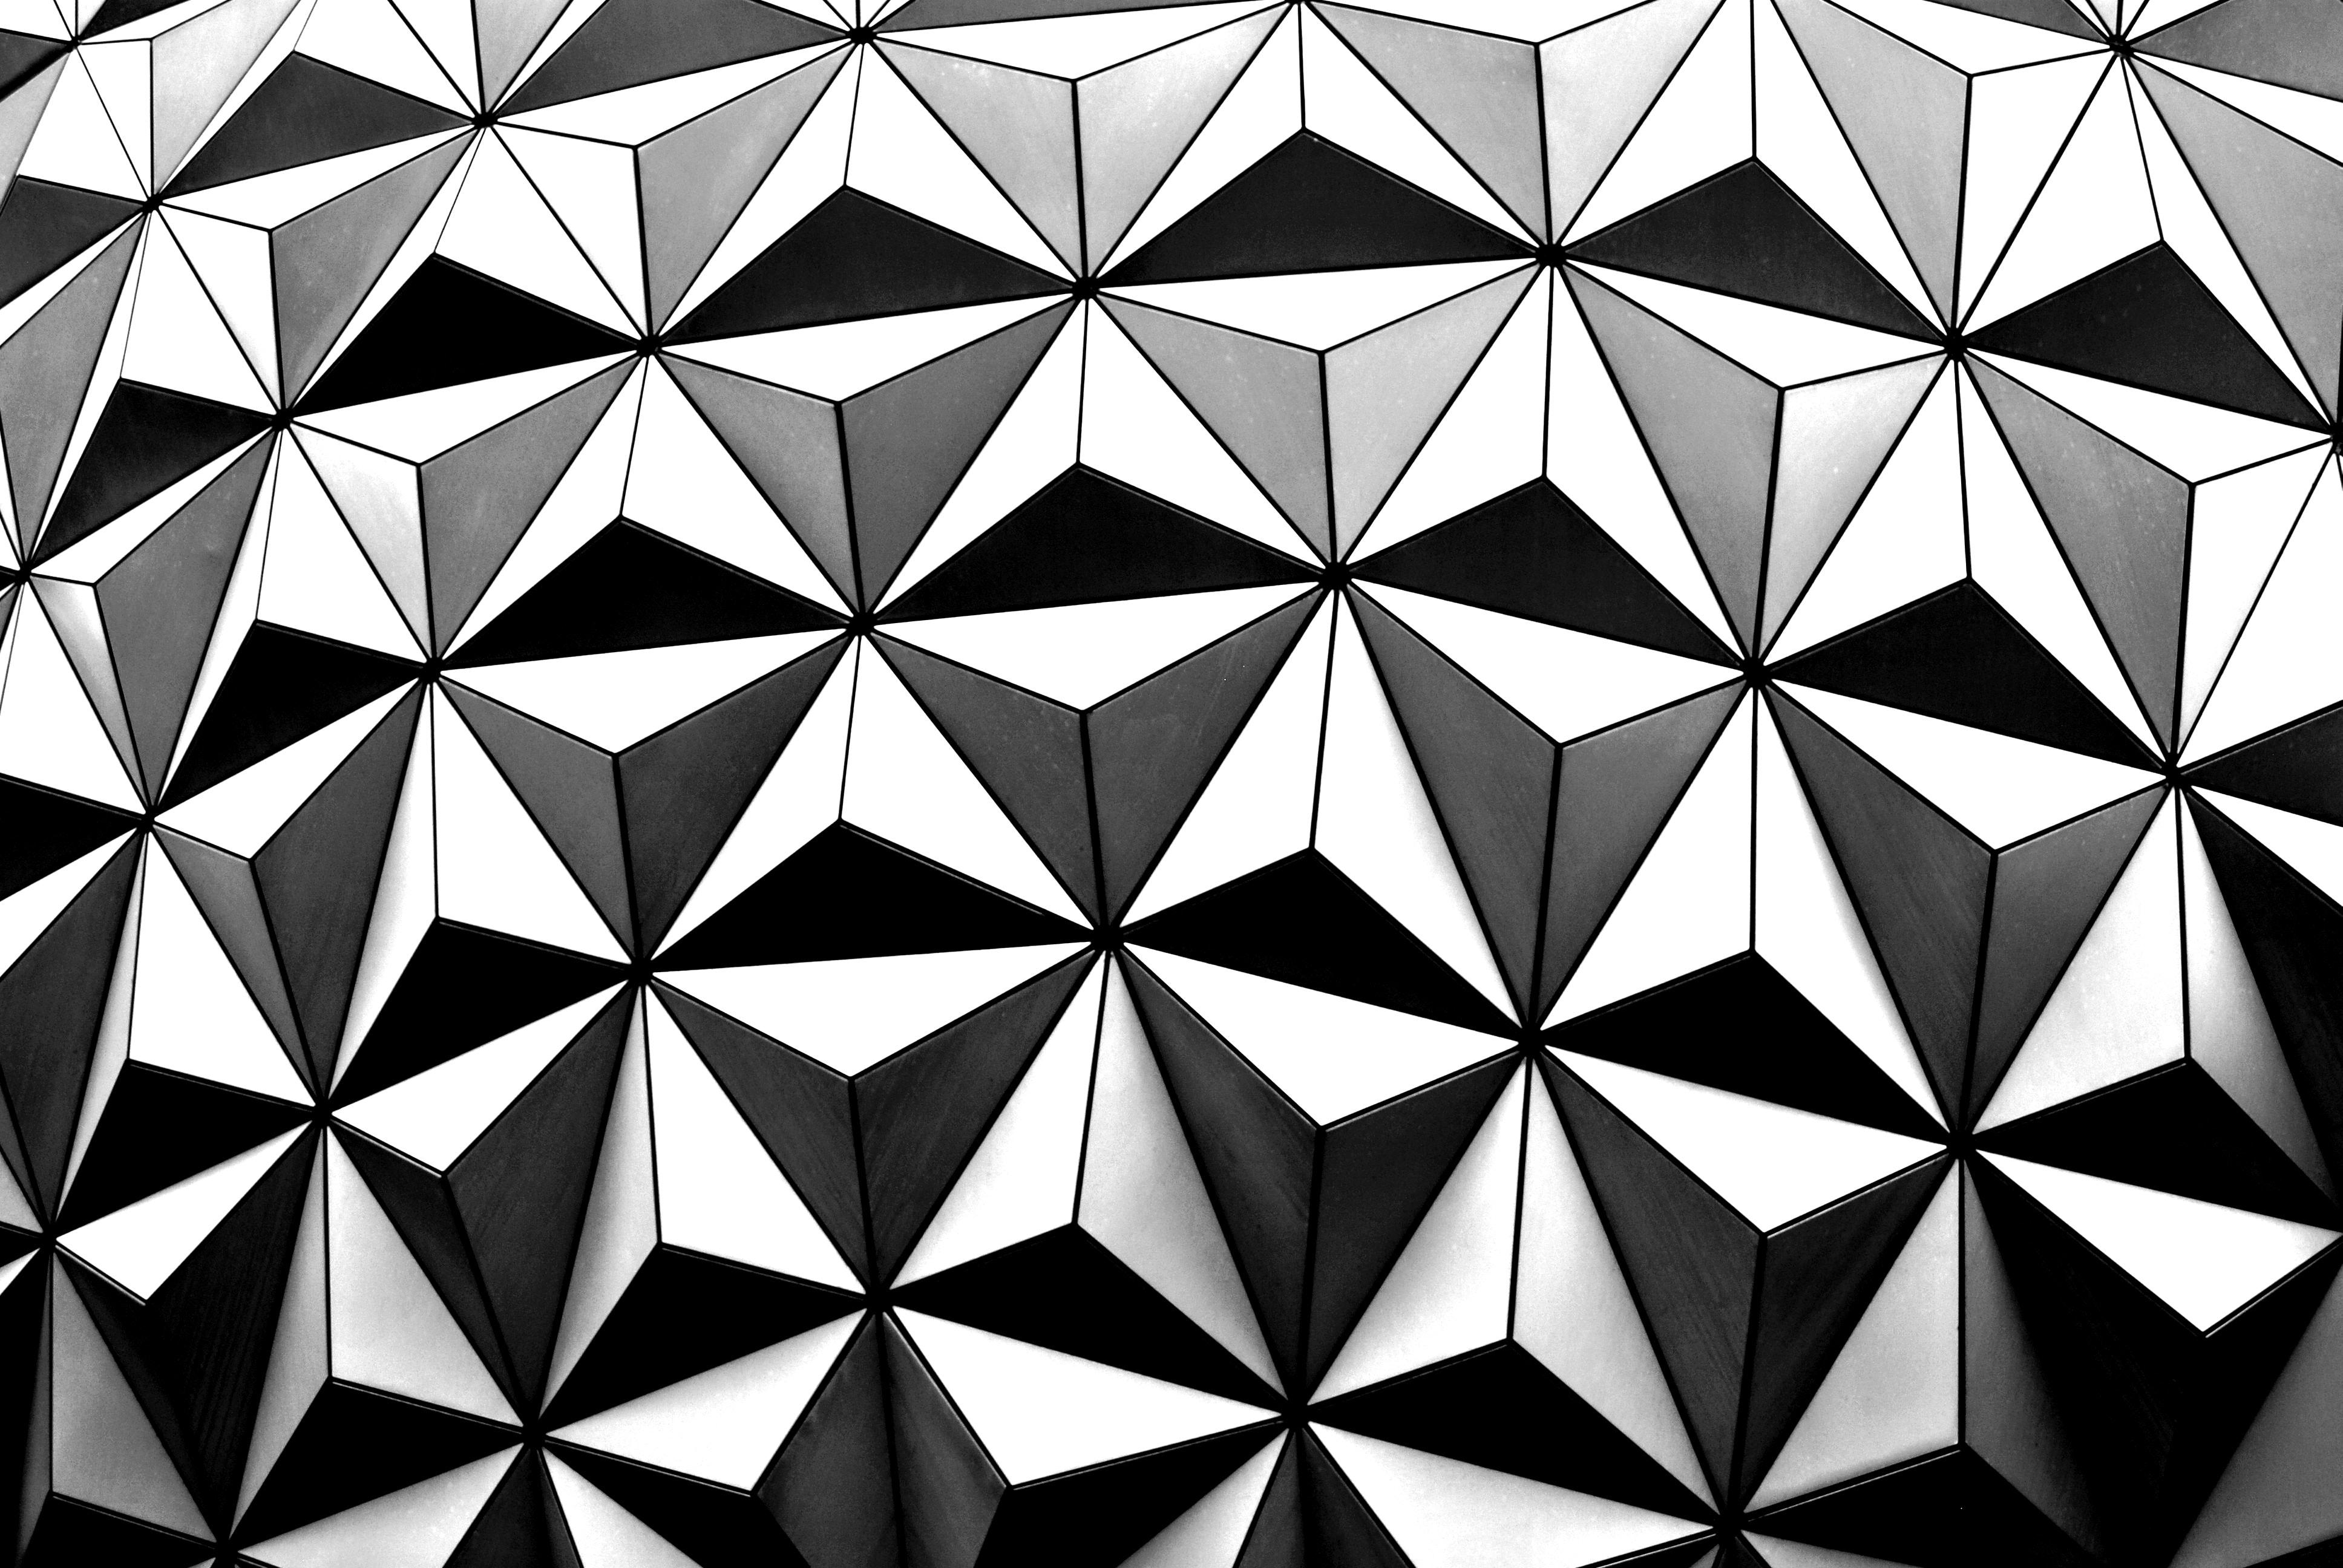 Line Art Software Free Download : Black and white diamond shape wallpaper · free stock photo